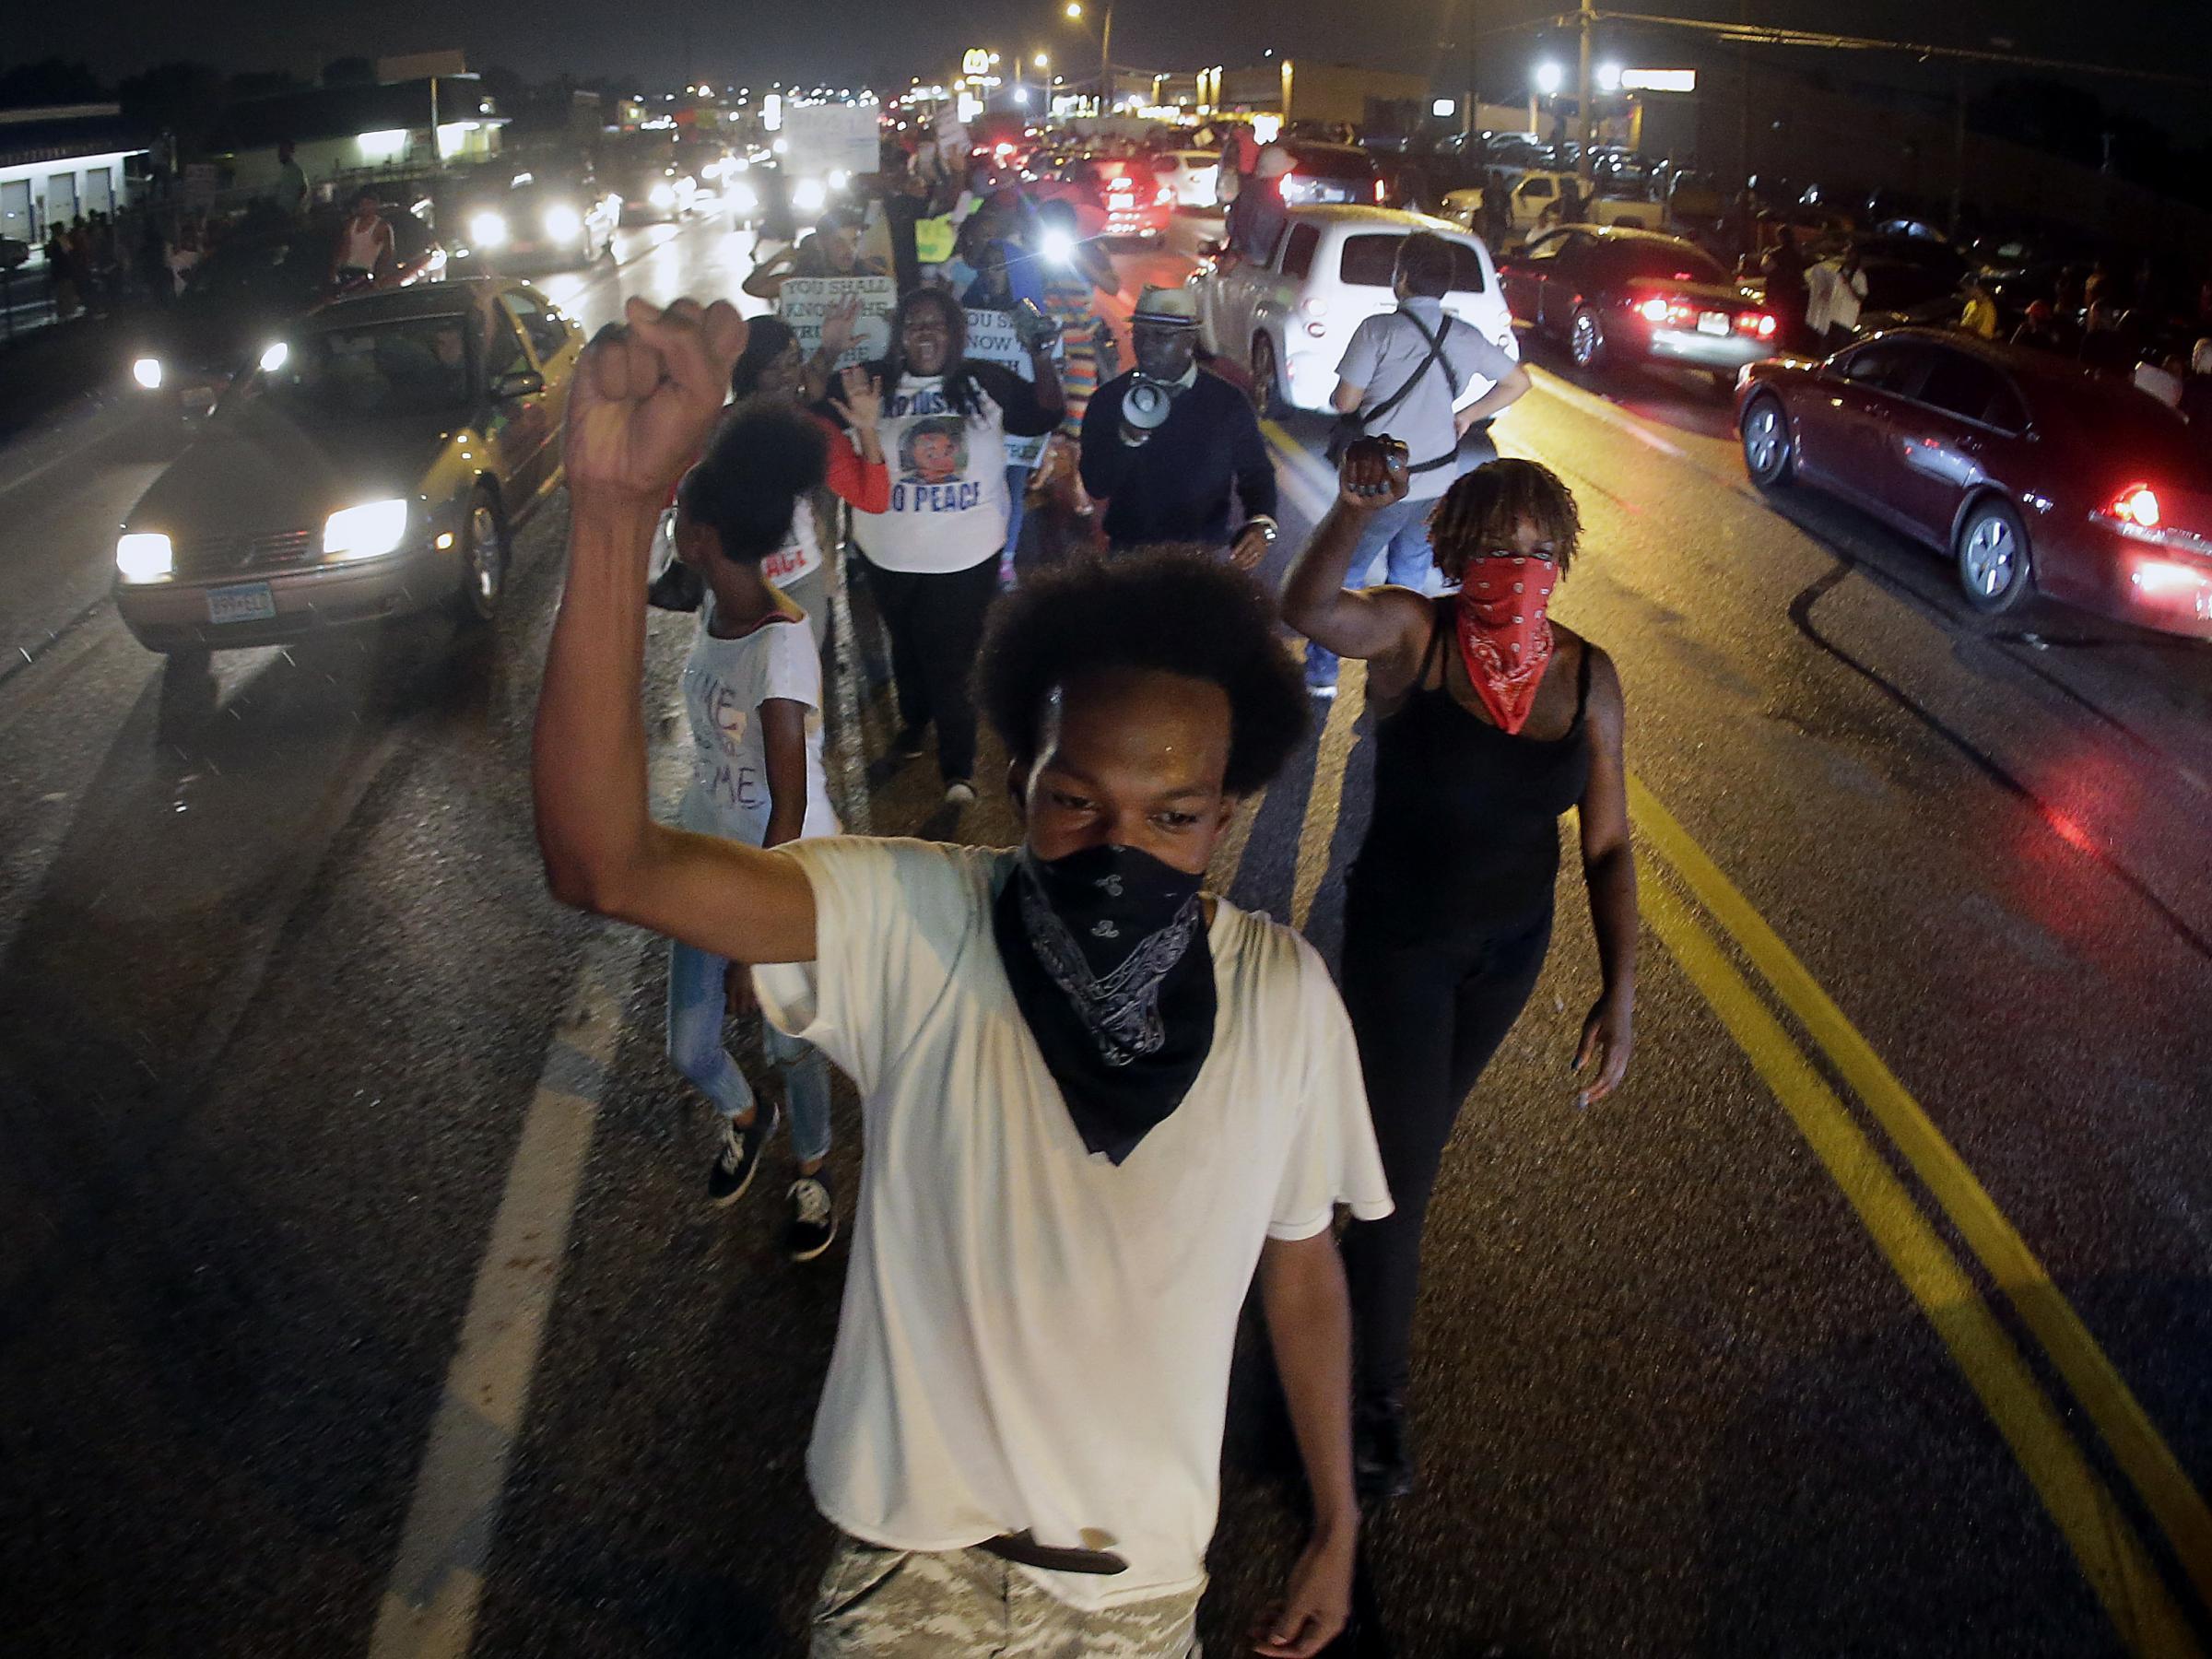 Discussing Ferguson - Sept. 12, 2014